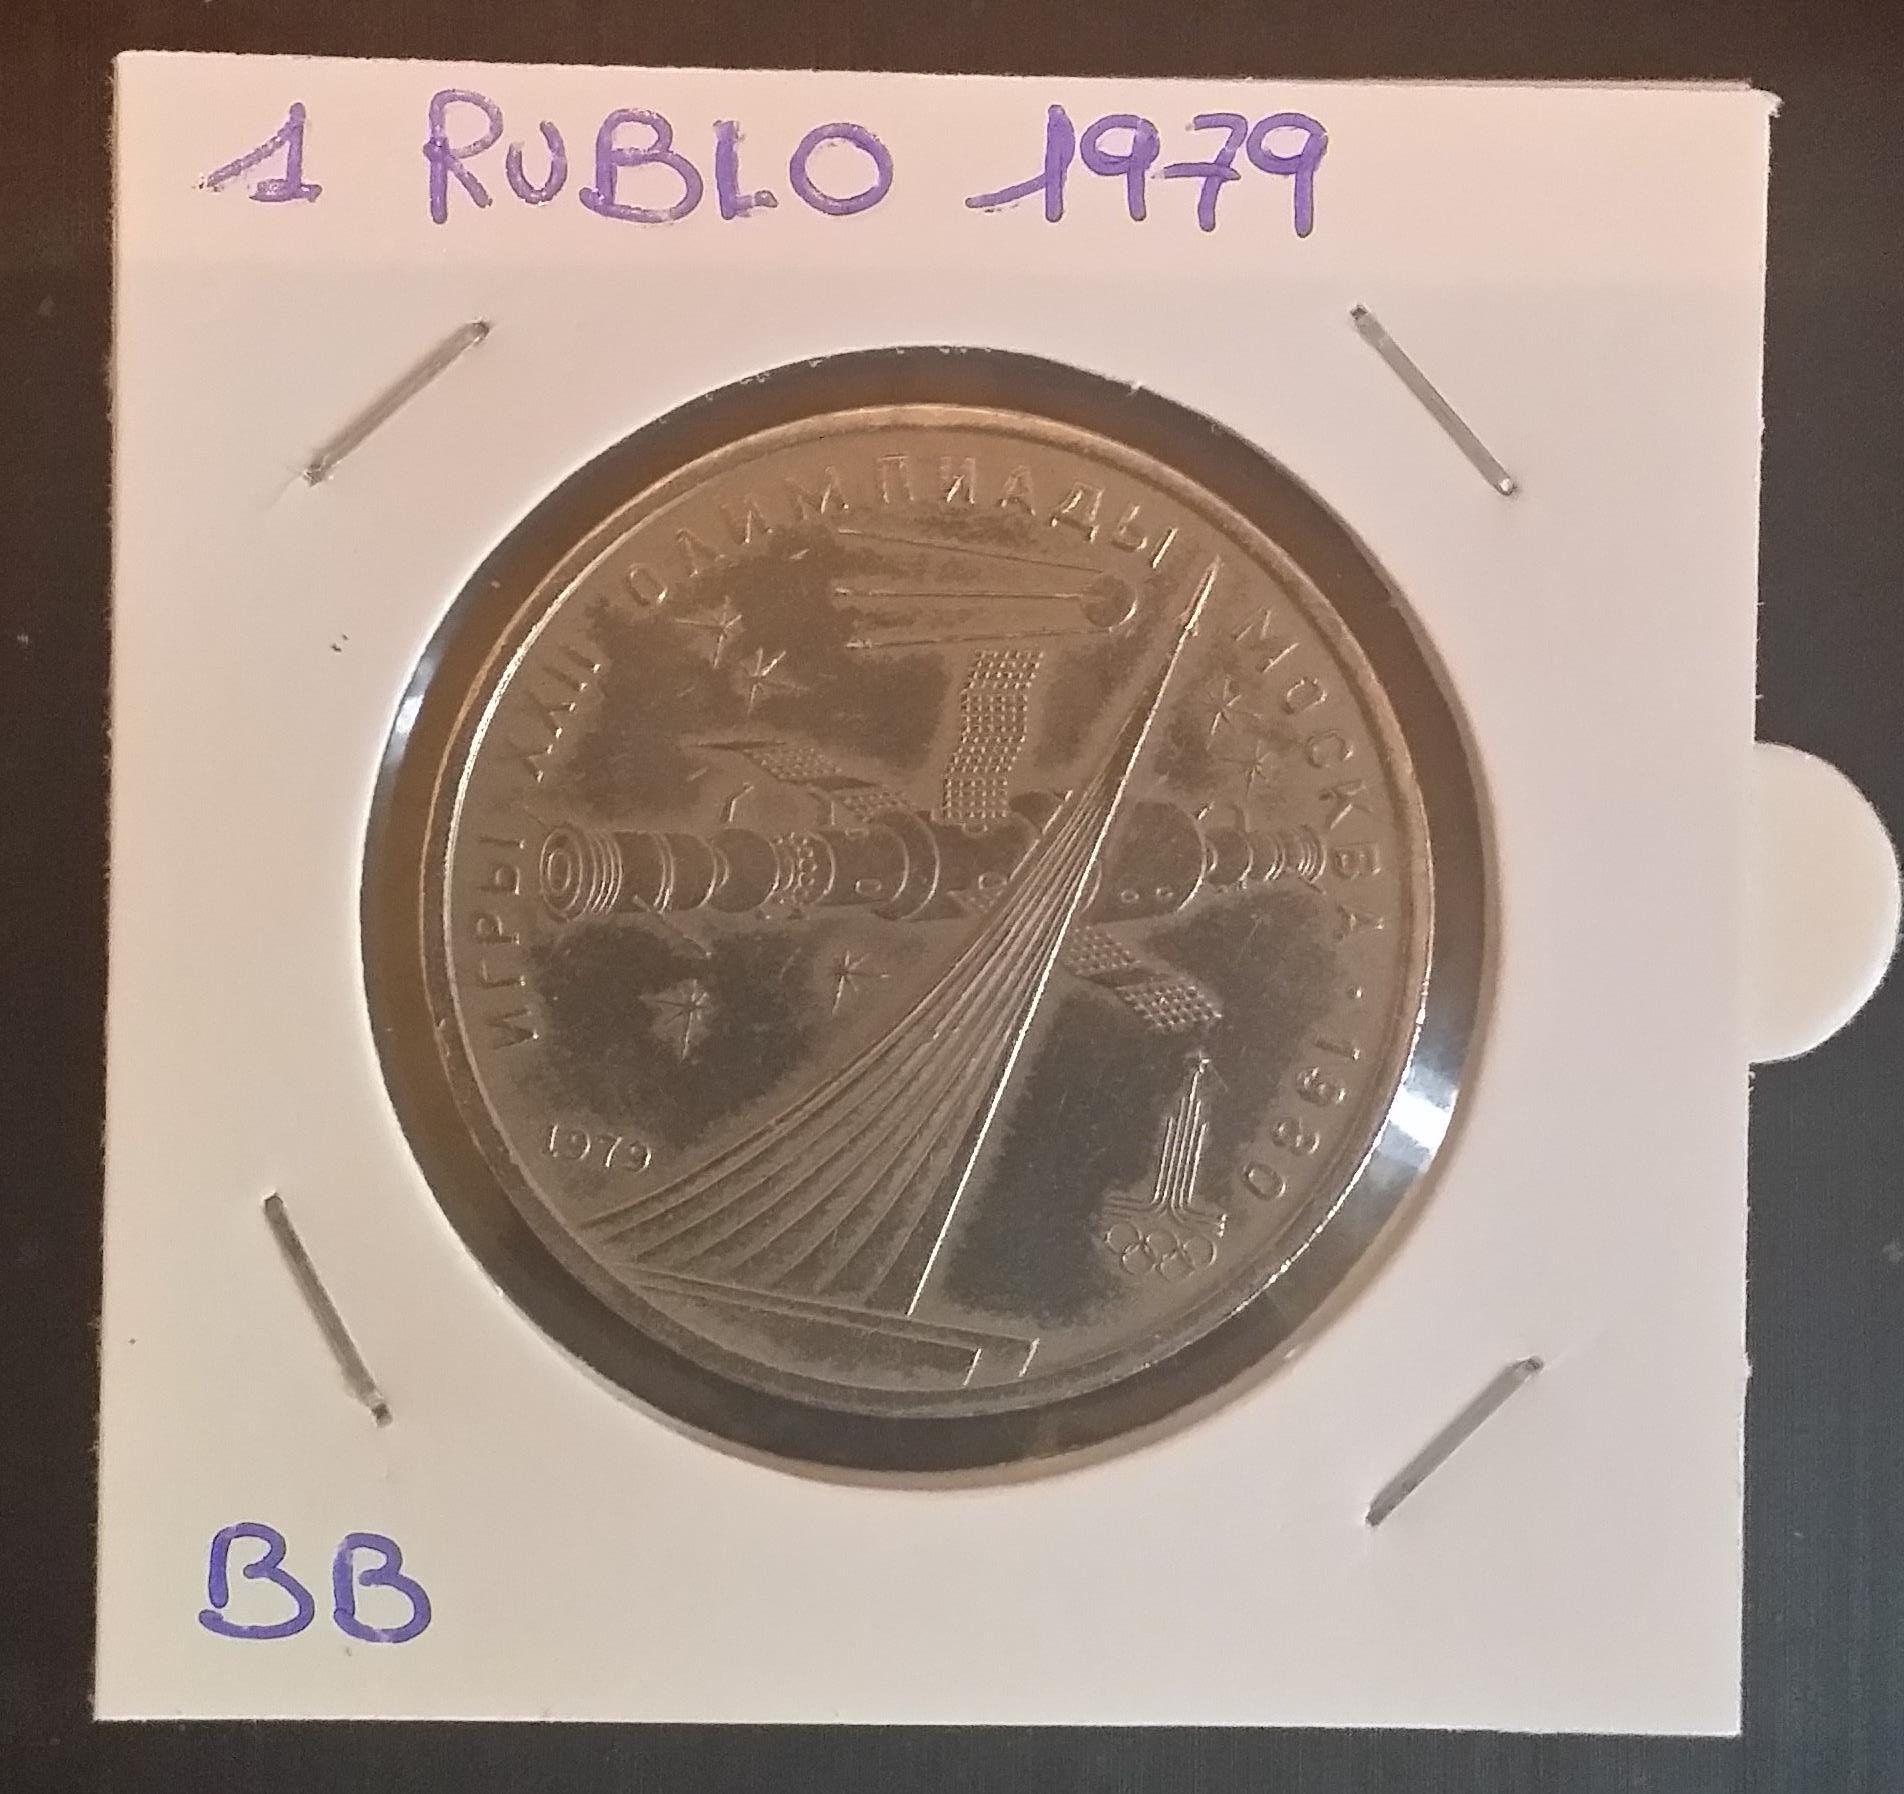 Coin Moneta 1 Rublo 1979 Russia Monet Monete Numismatica